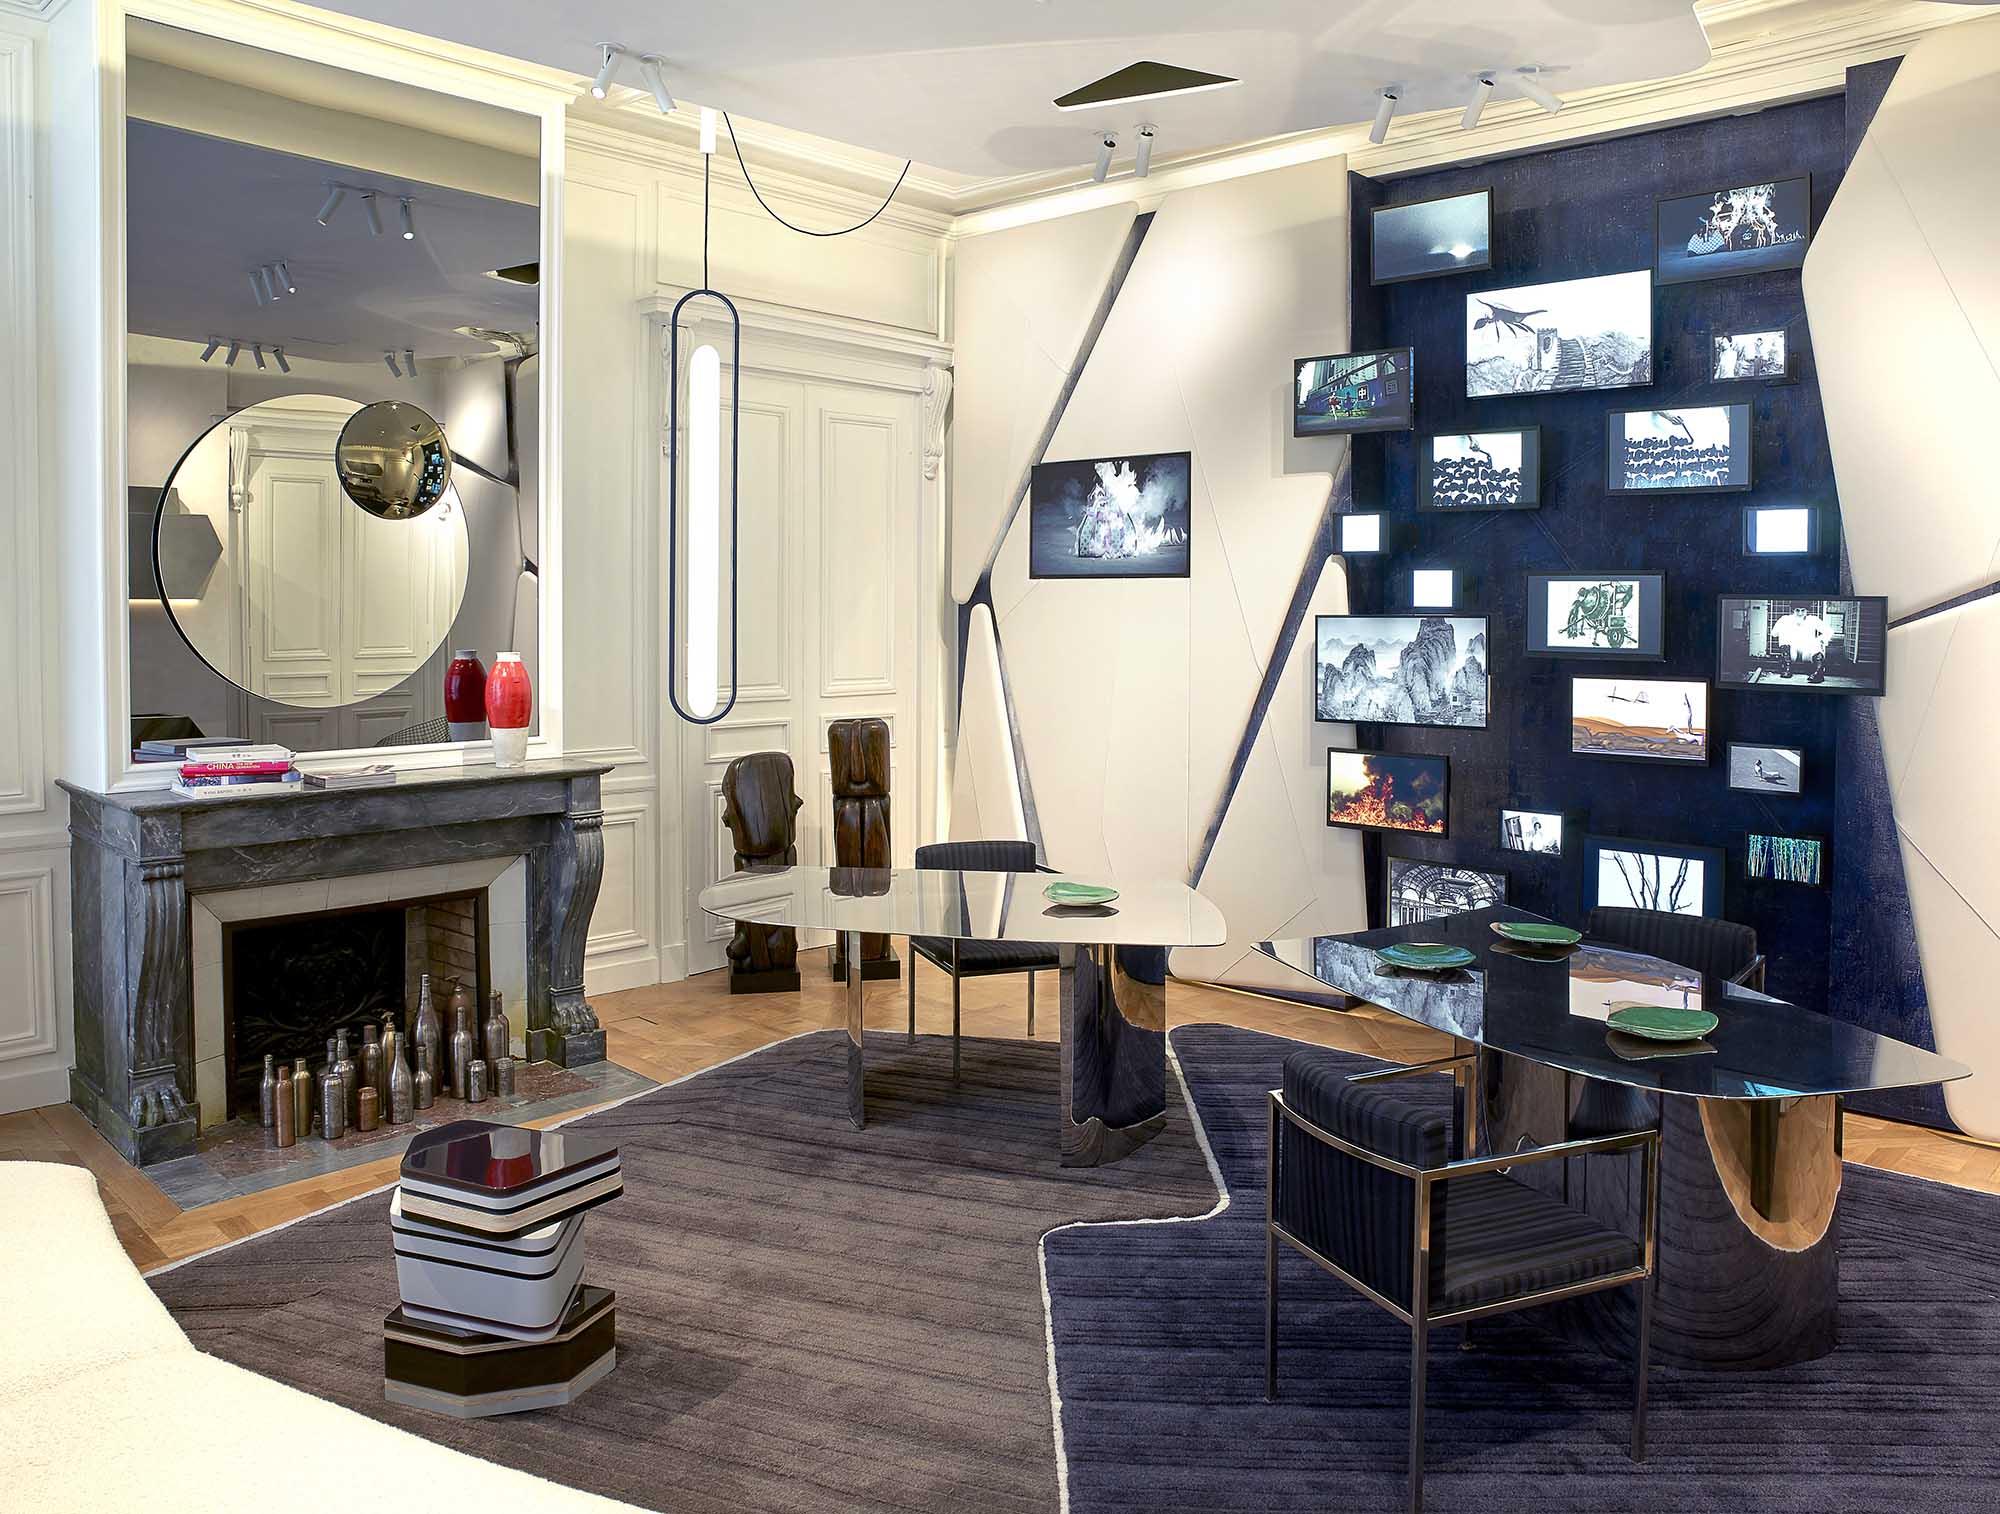 Bismut & Bismut Architectes daniel & michel bismut   parexcellence new york